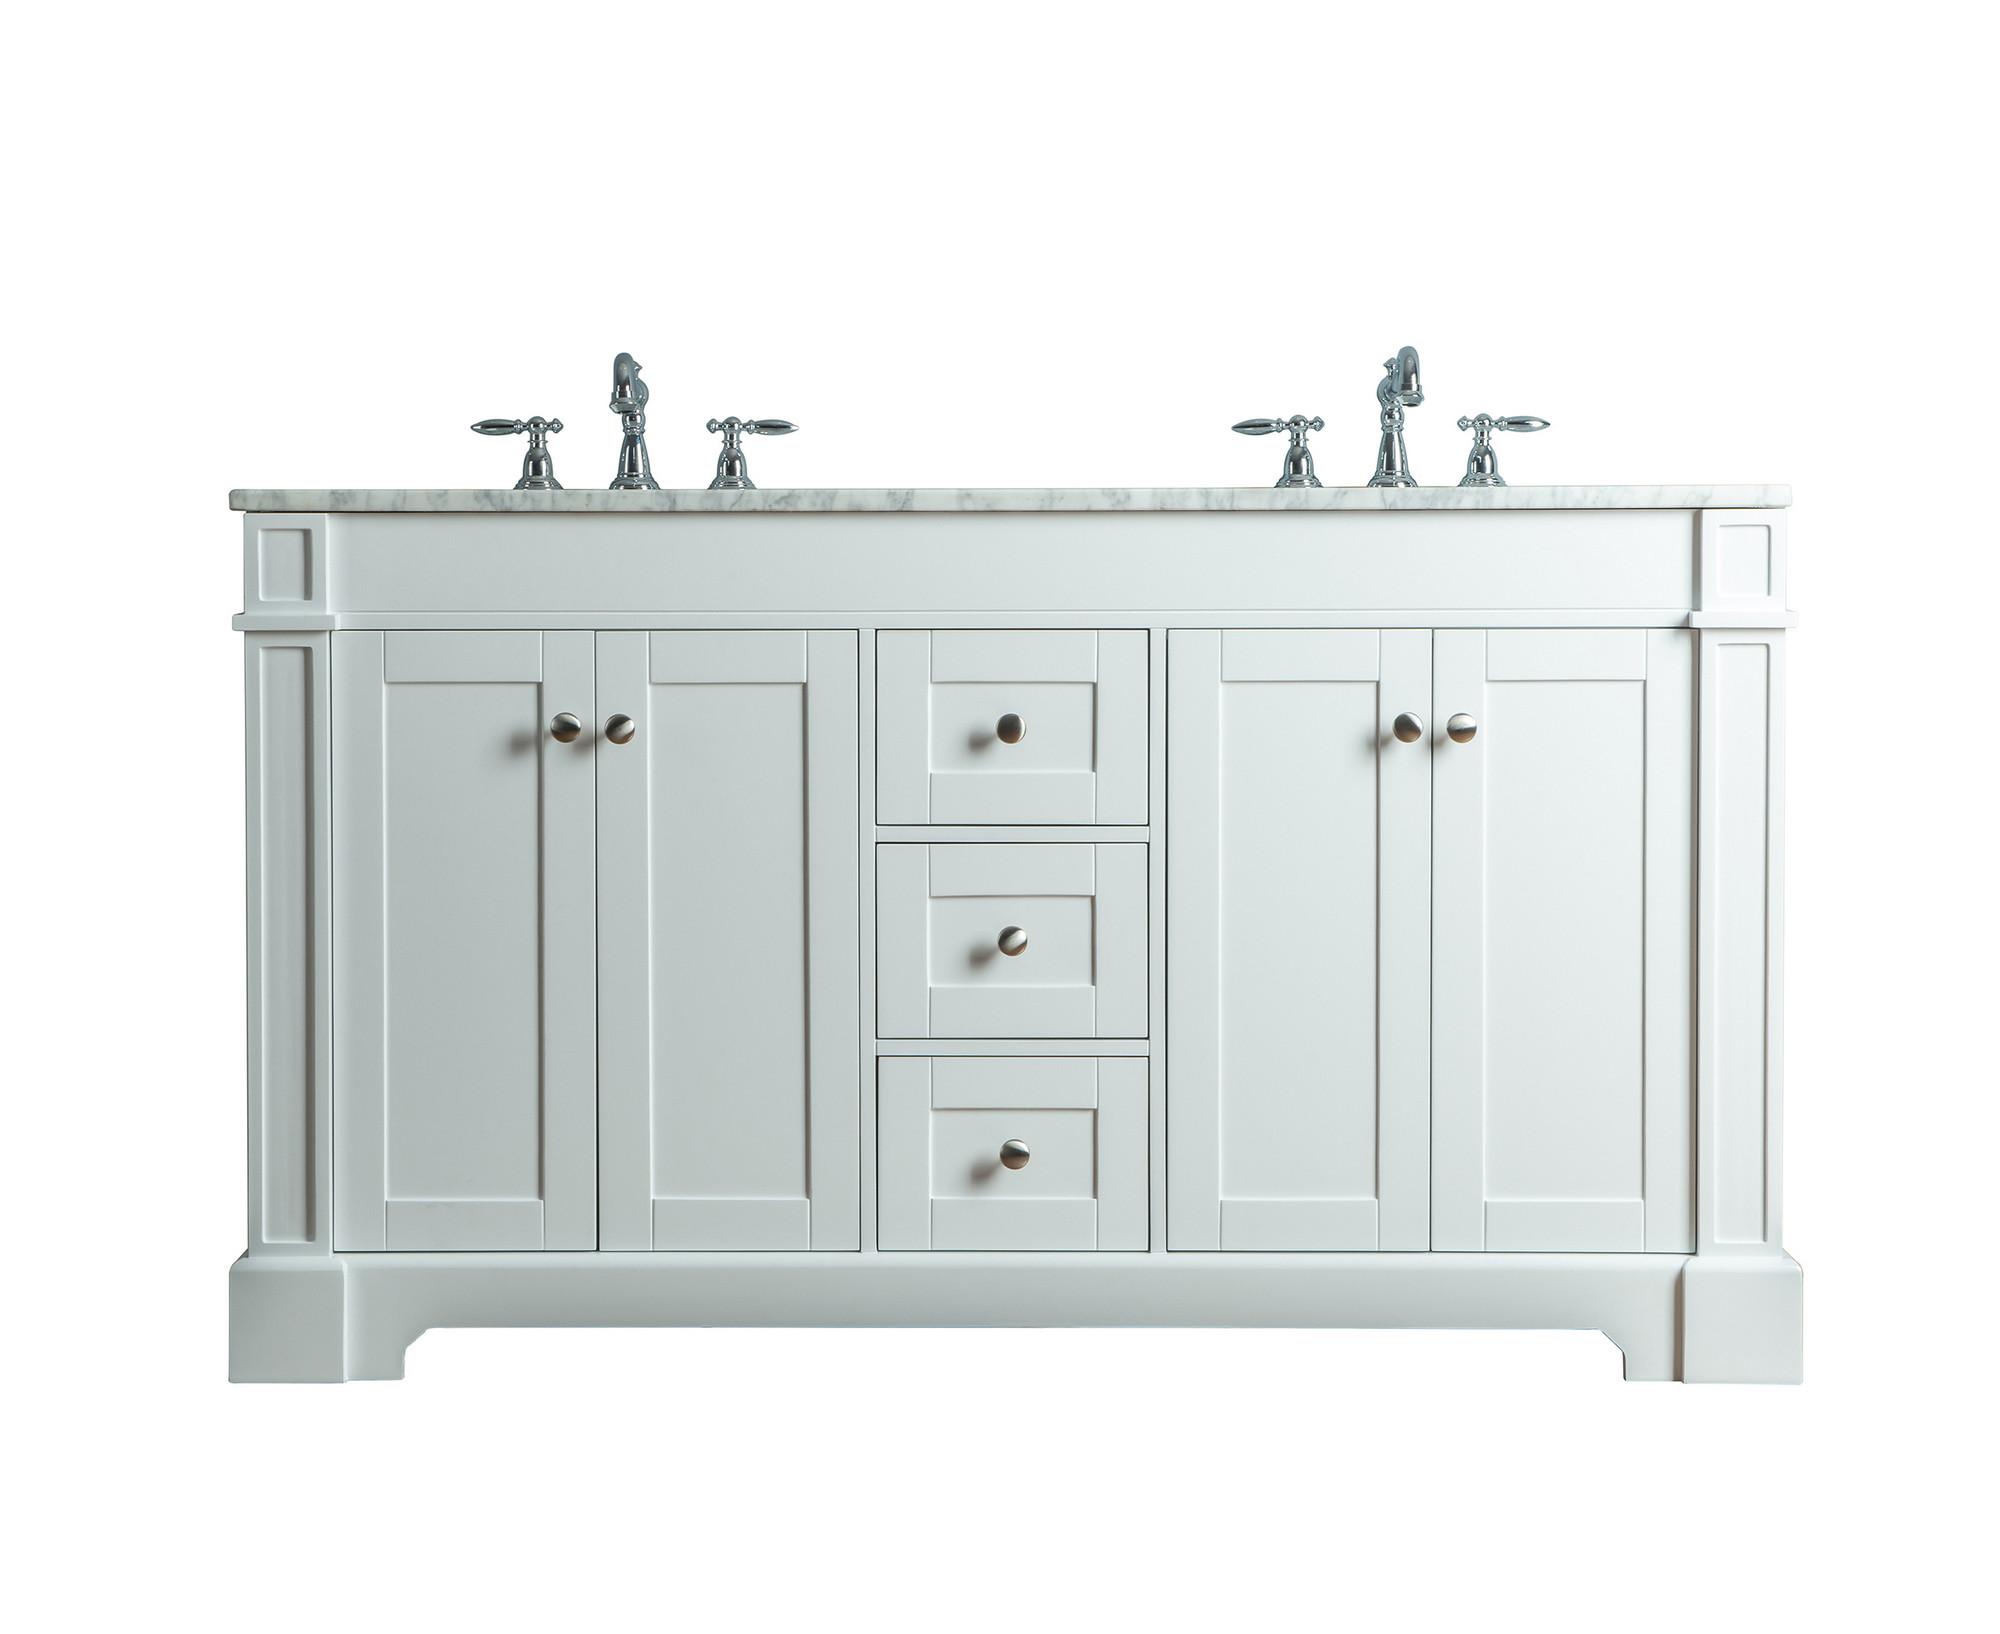 Stufurhome HD-1632W-60-CR Seine Double Sink Bathroom Vanity In White